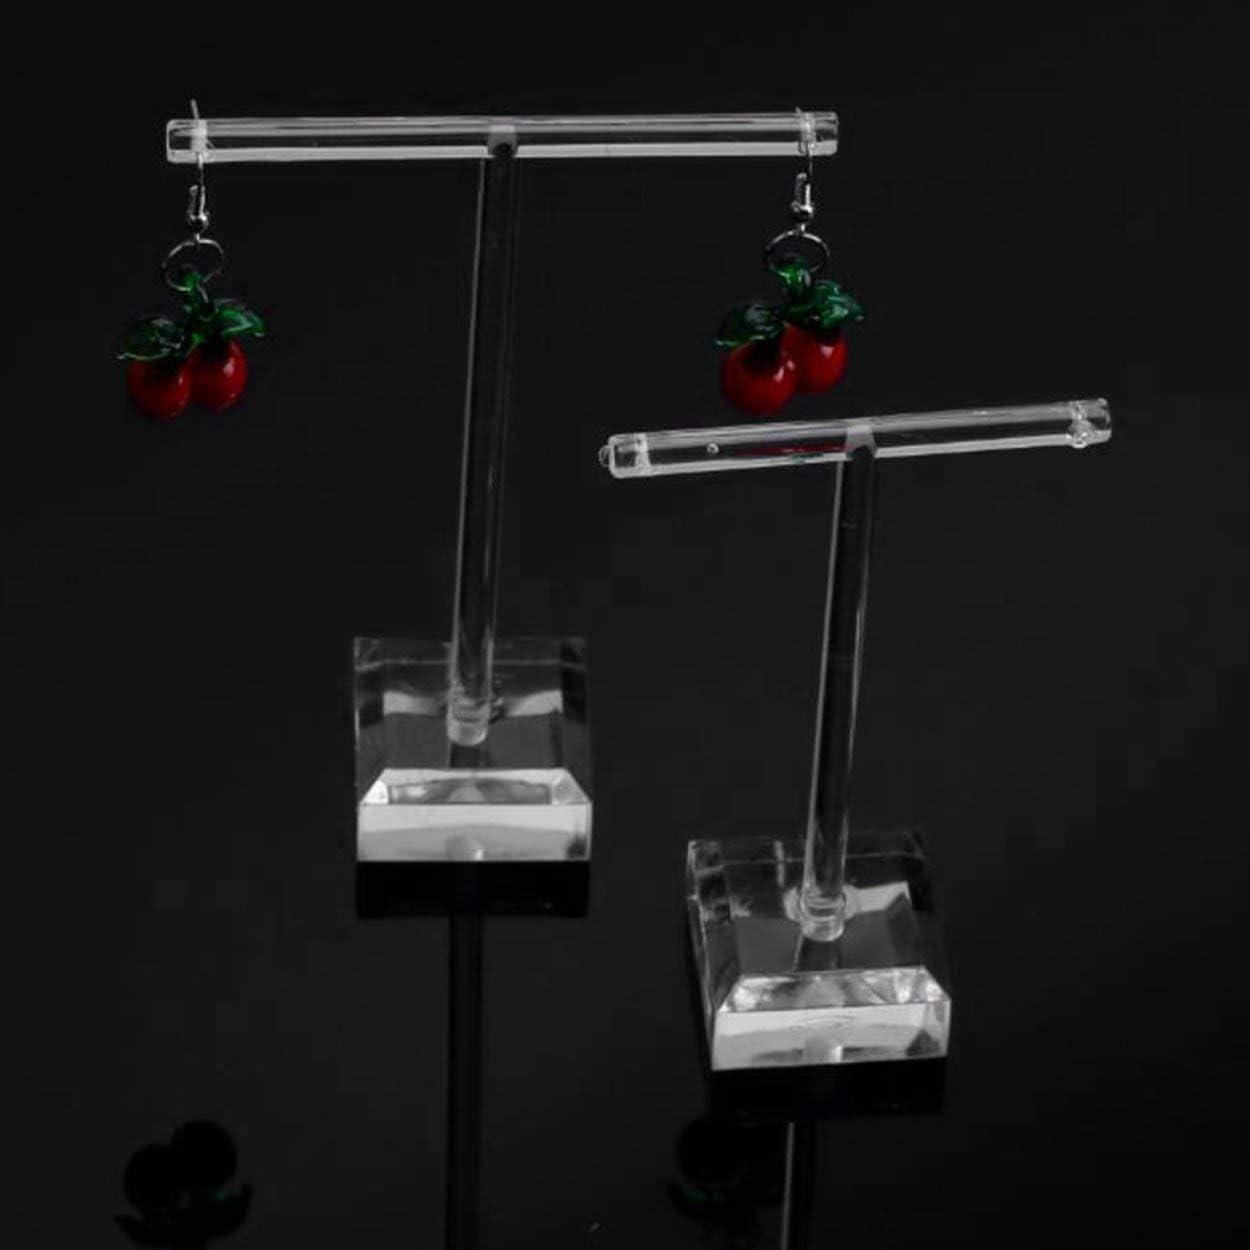 2pcs//Set Clear Plastic Earrings Showcase Display T Bar Stand Holder Organizer